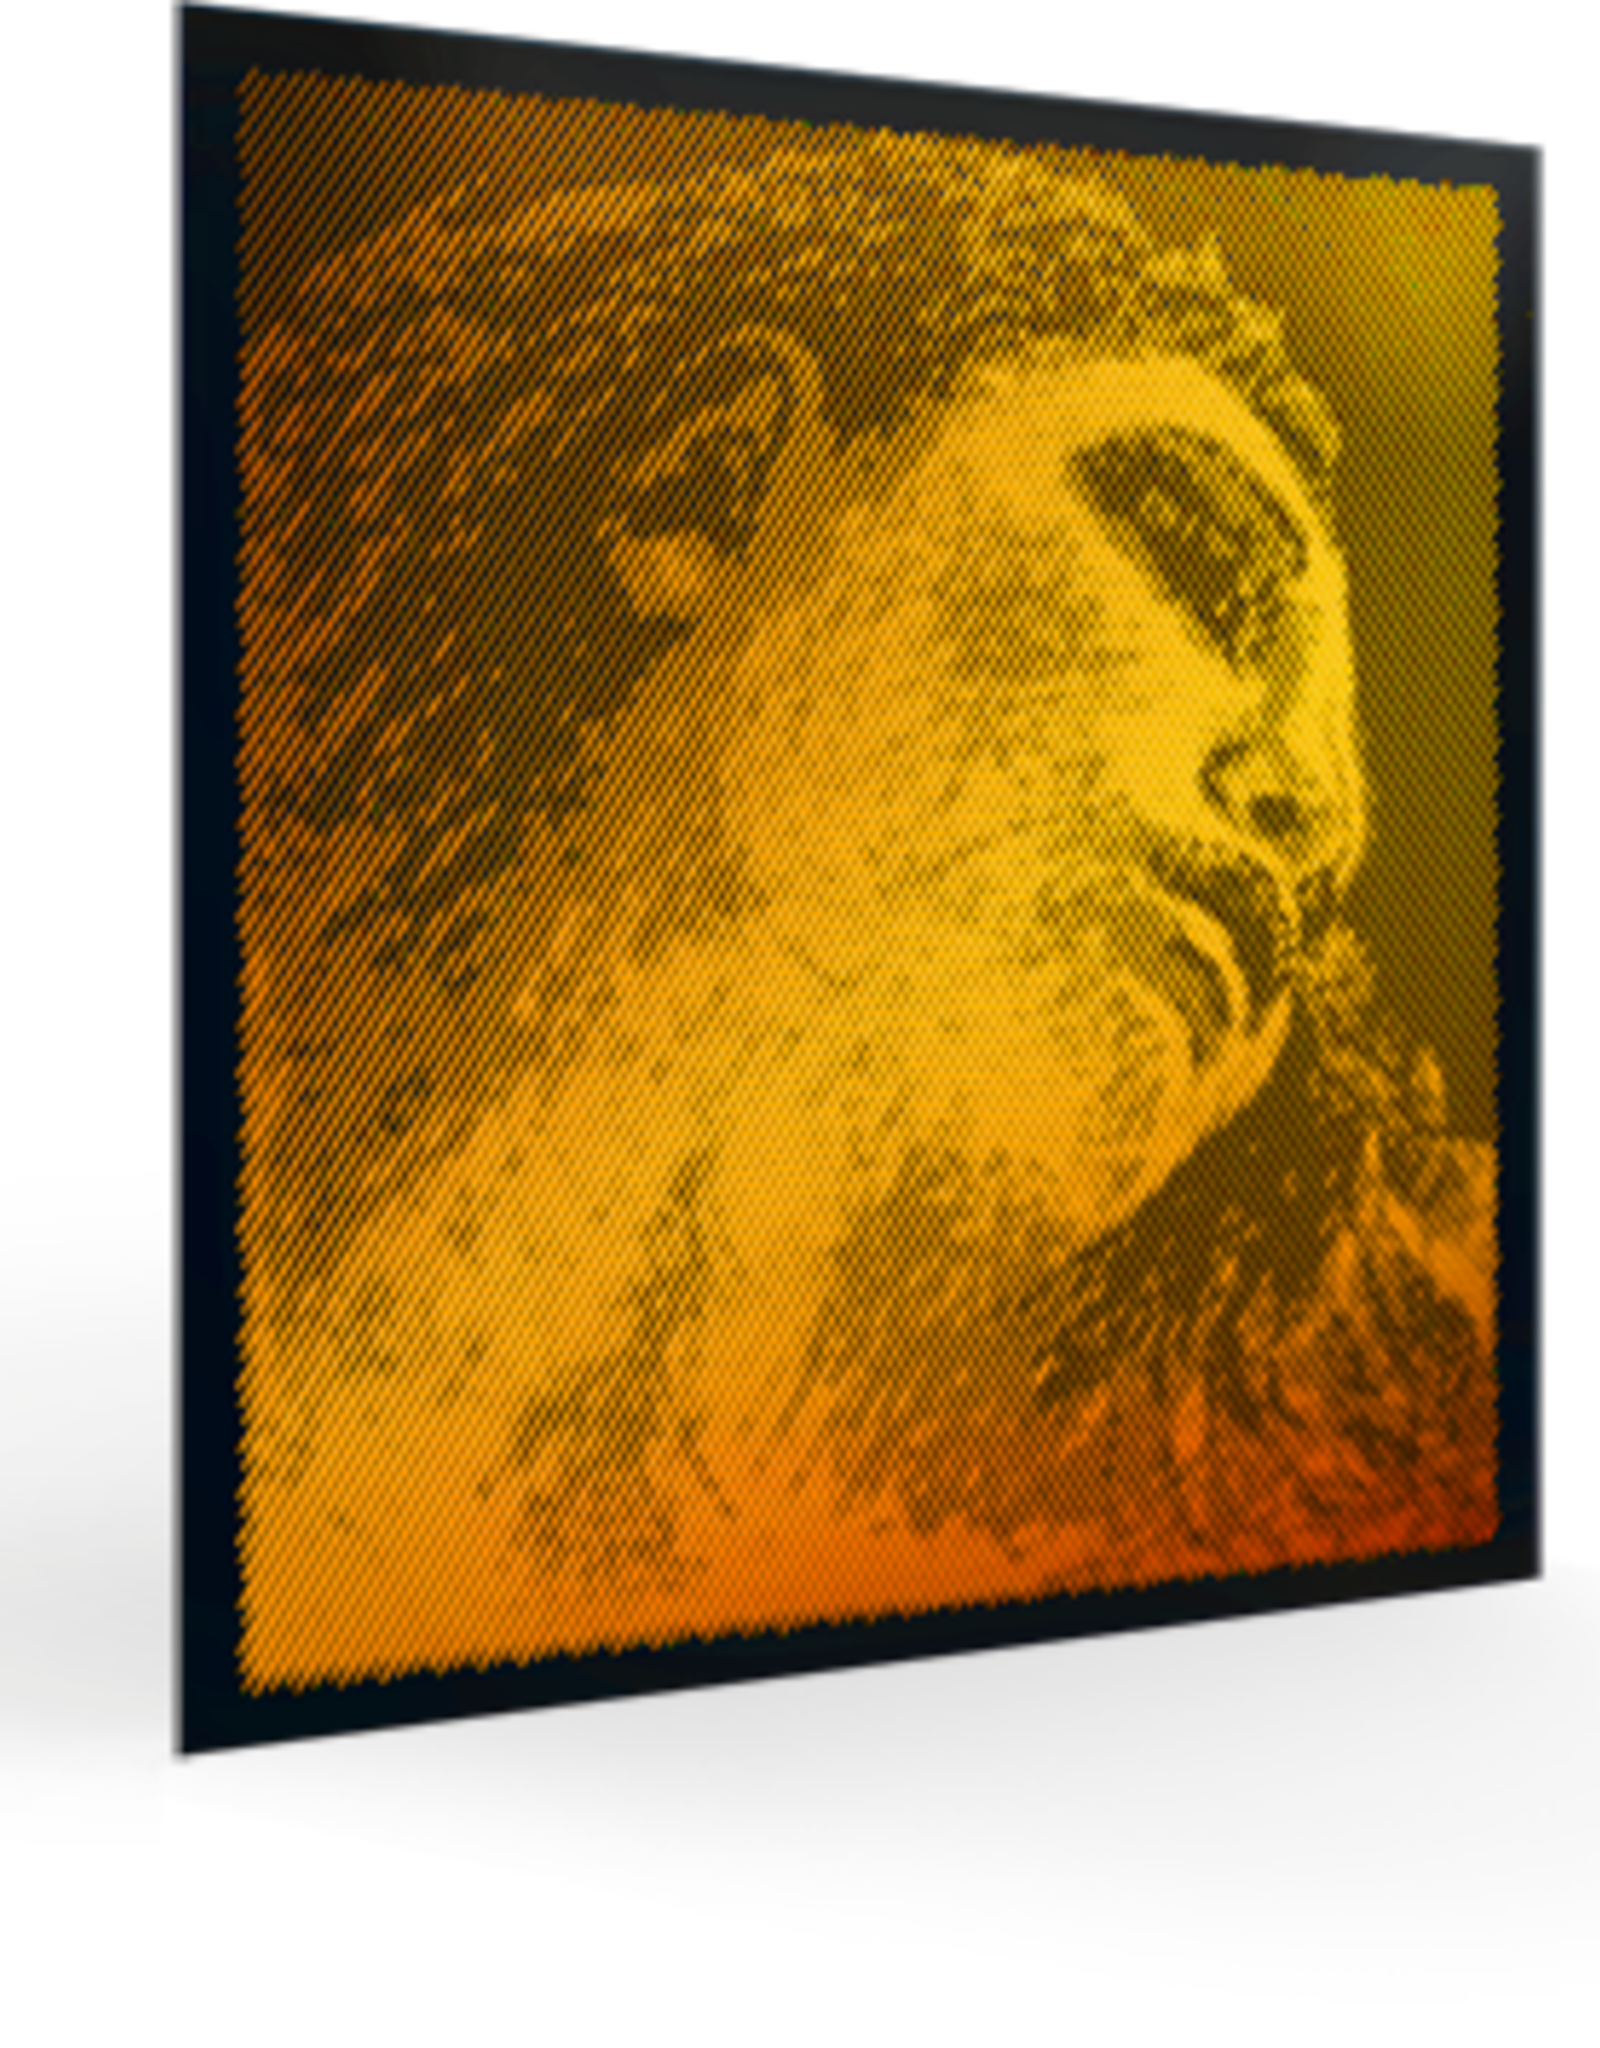 PIRASTRO Evah Pirazzi GOLD vioolsnaar e-1, 4/4, ball of loop end